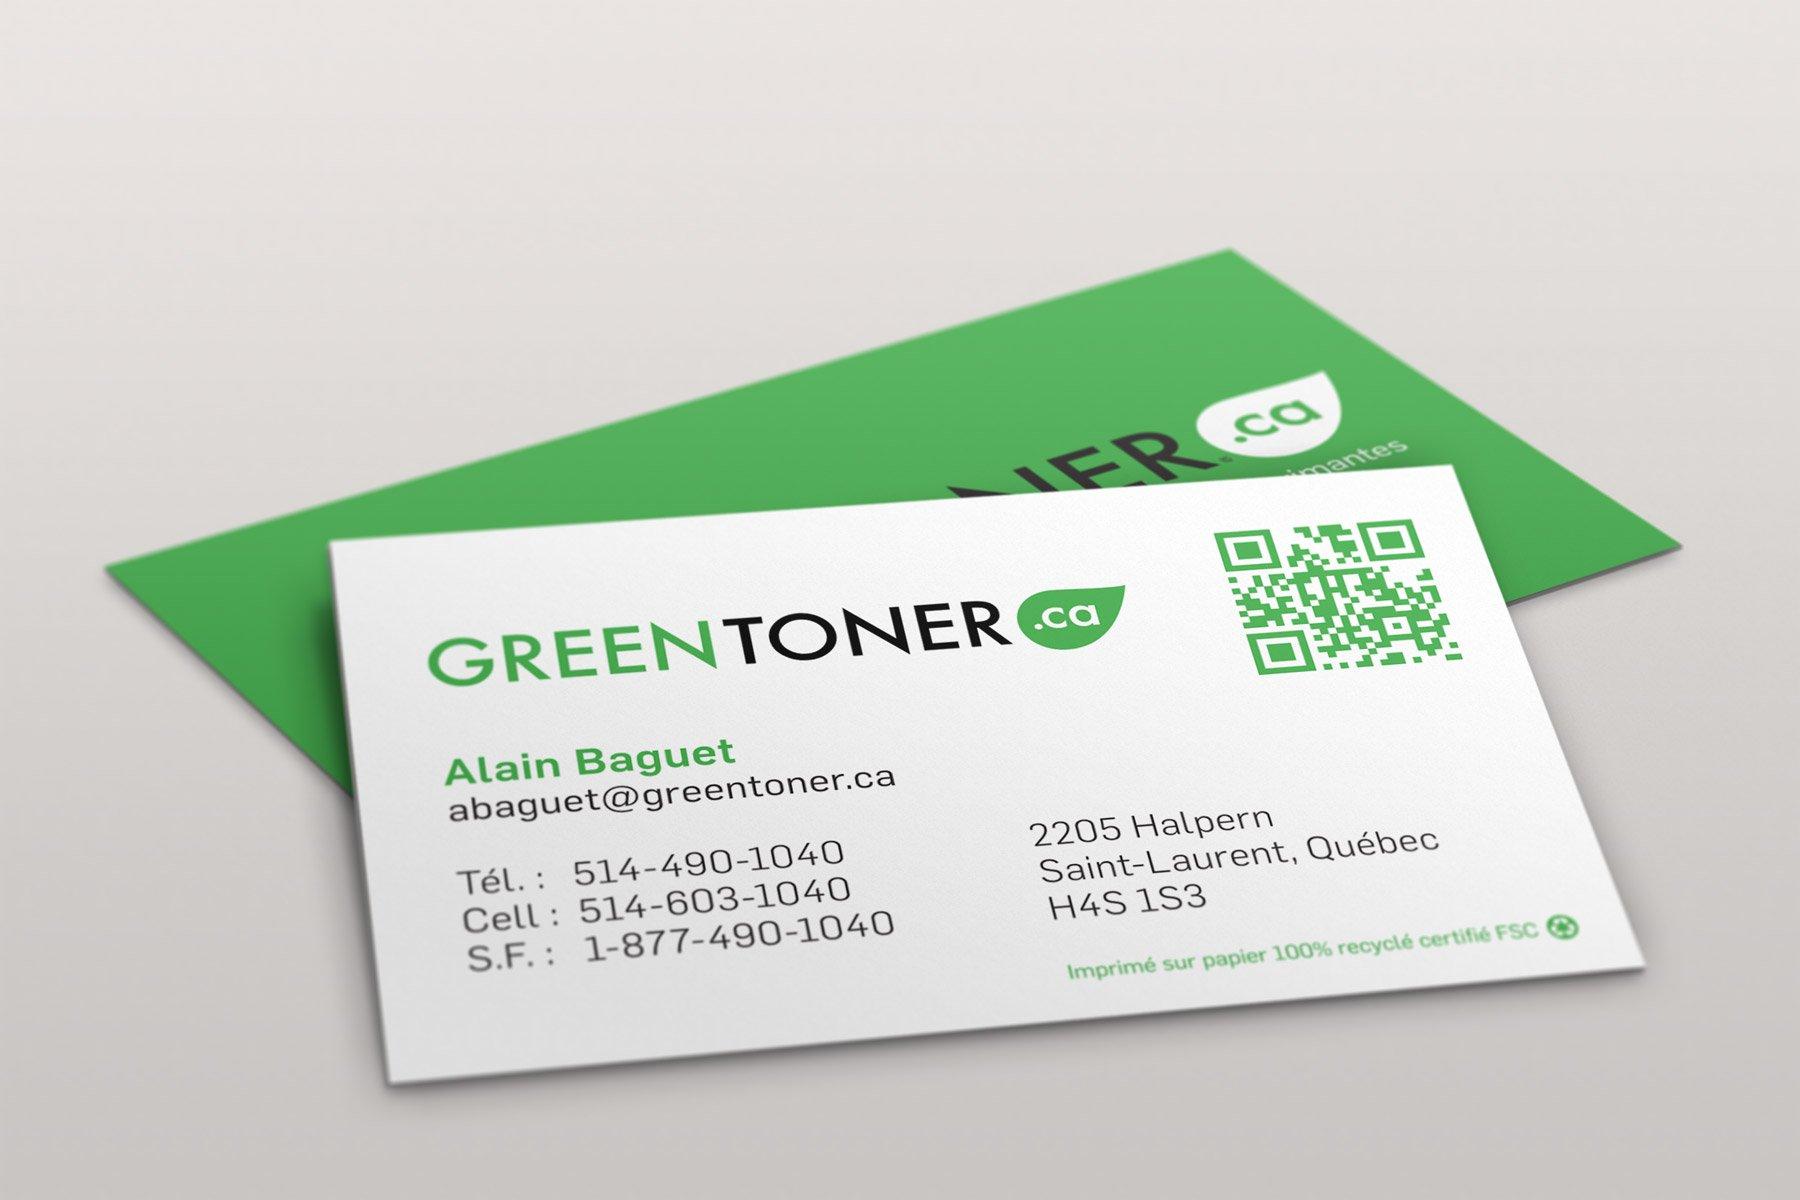 IMD-Greentoner-Carte-Mockup-Fx-Blur Greentoner - logo